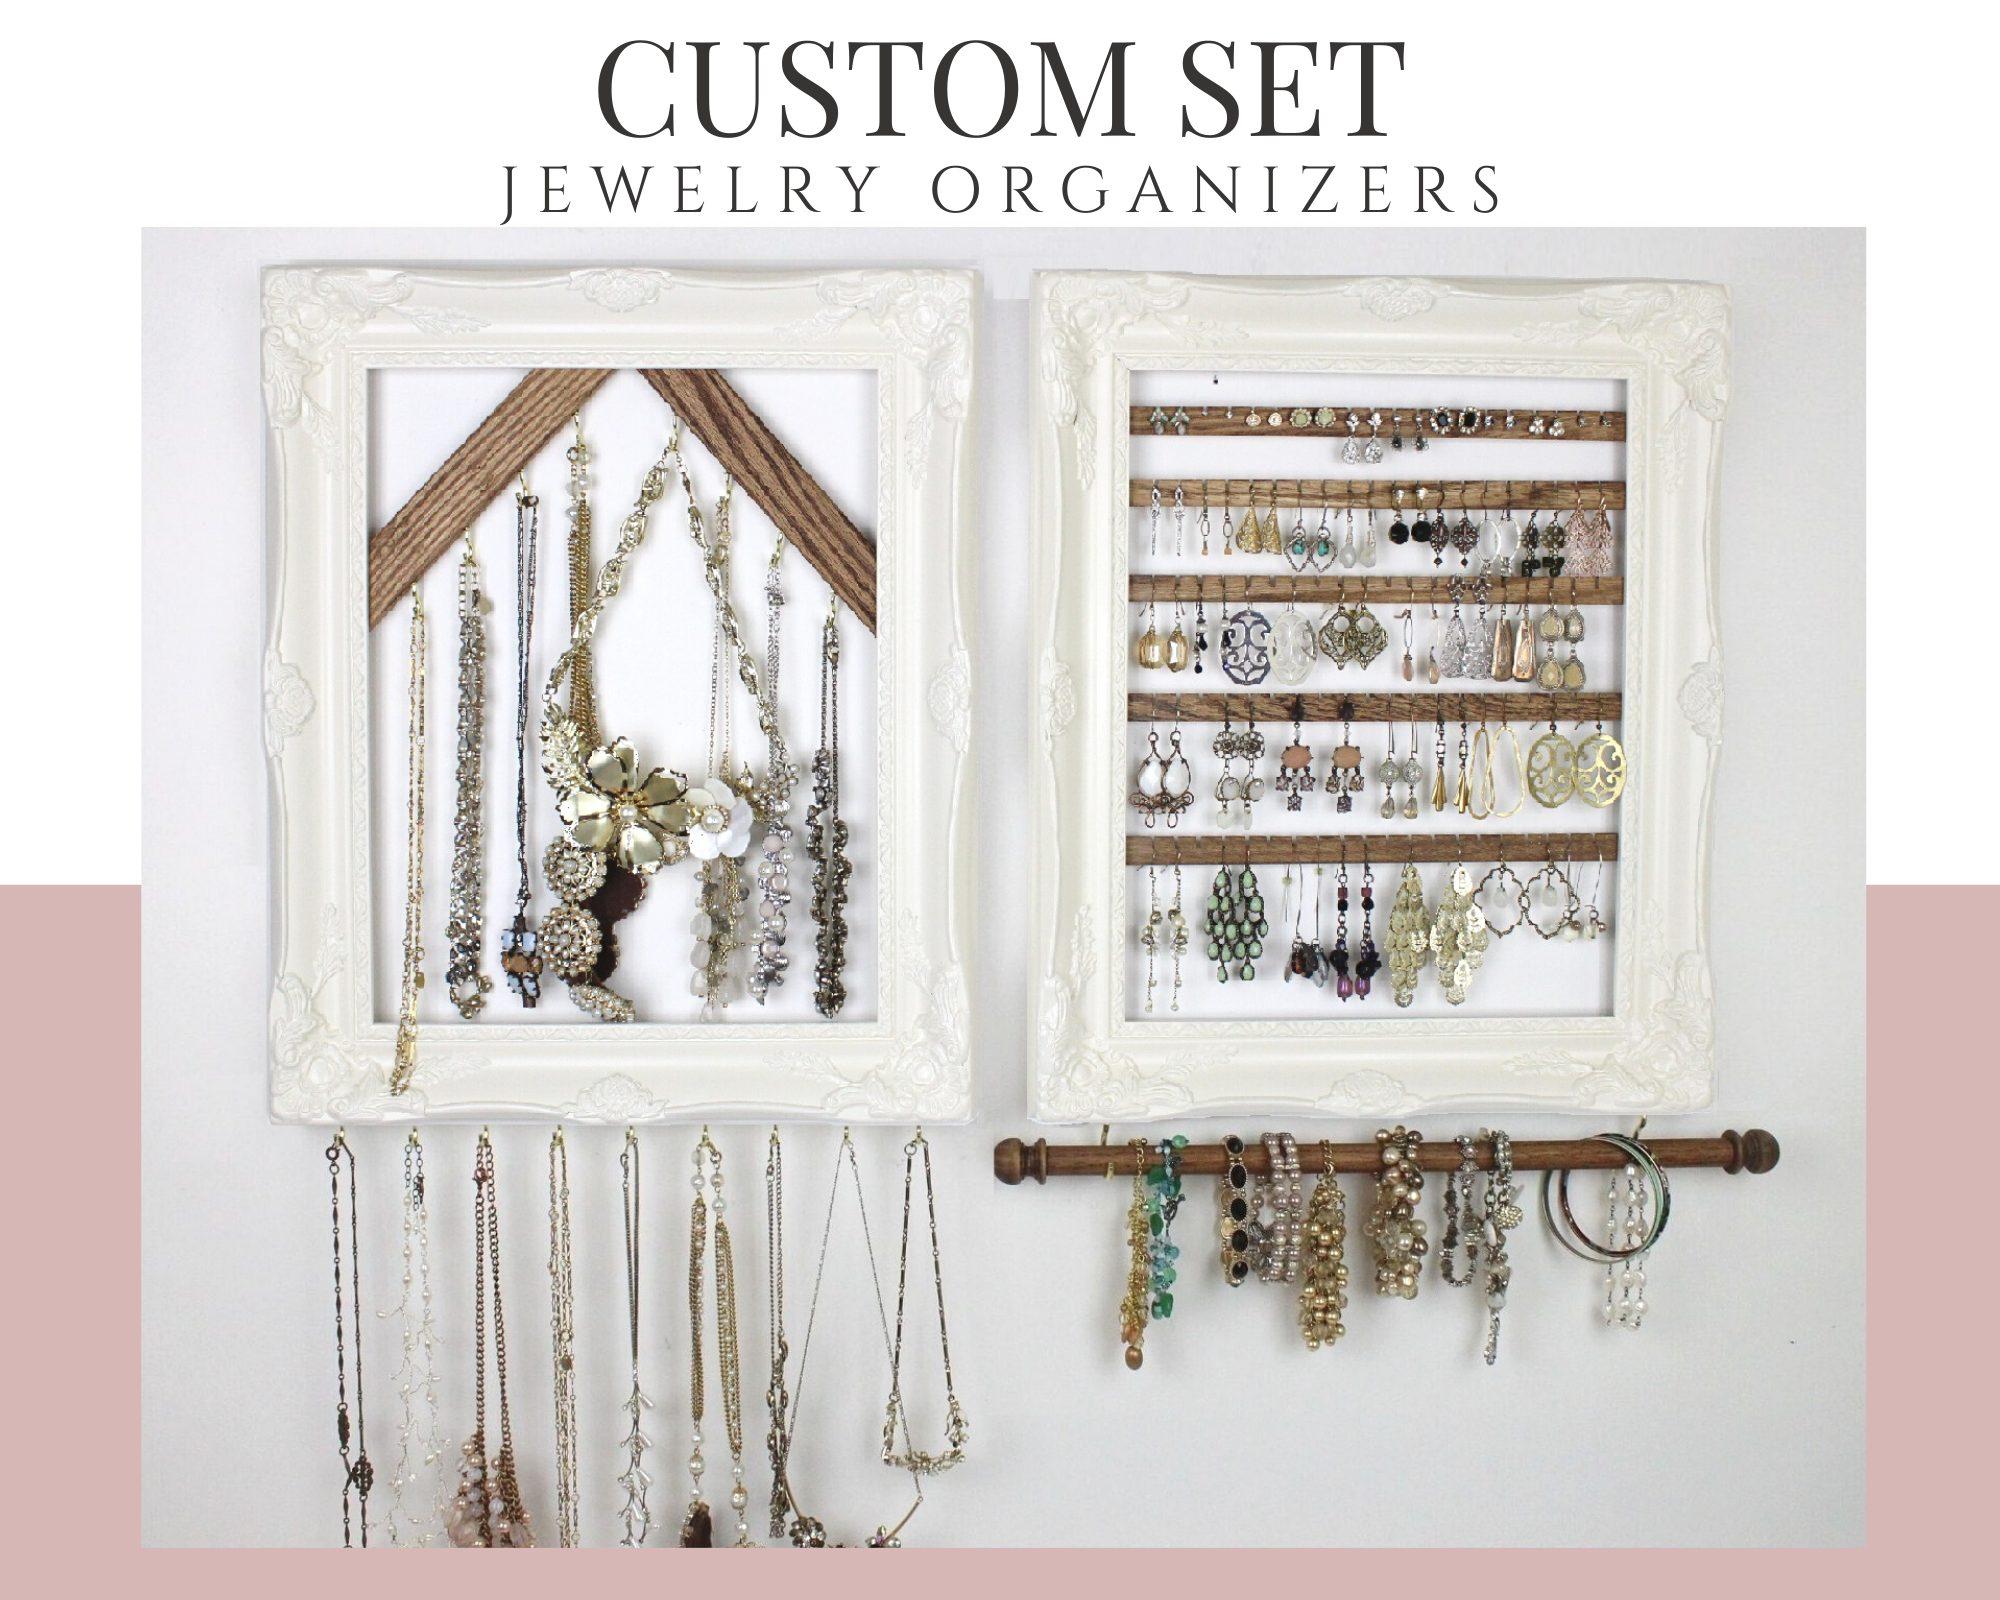 Wall Hanging Jewelry Organizer Set